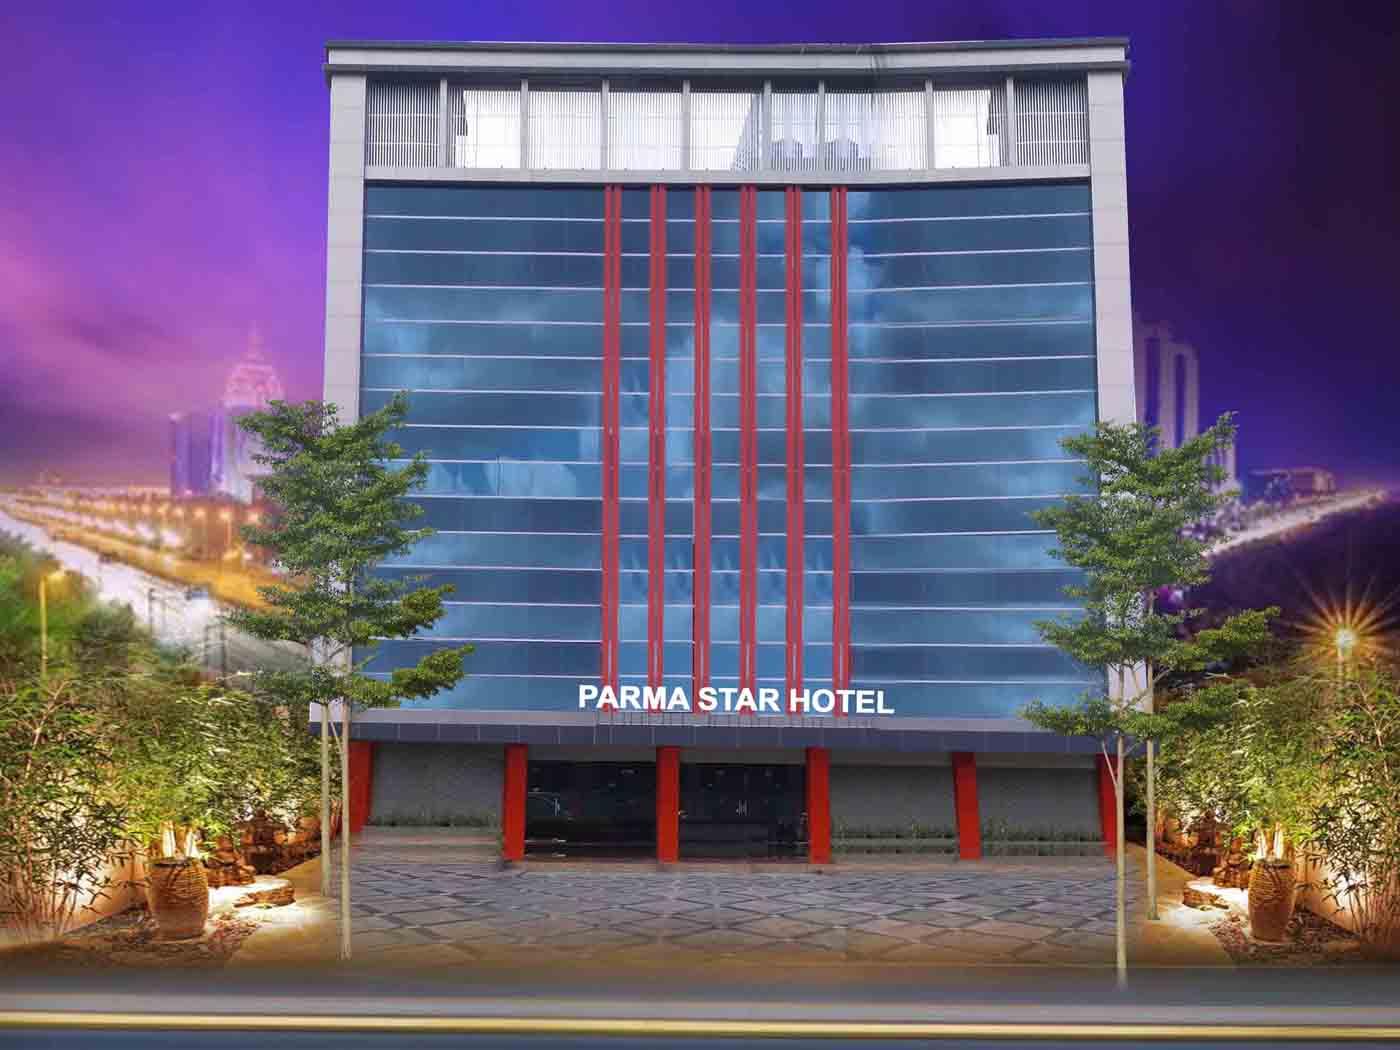 Parma Star Hotel